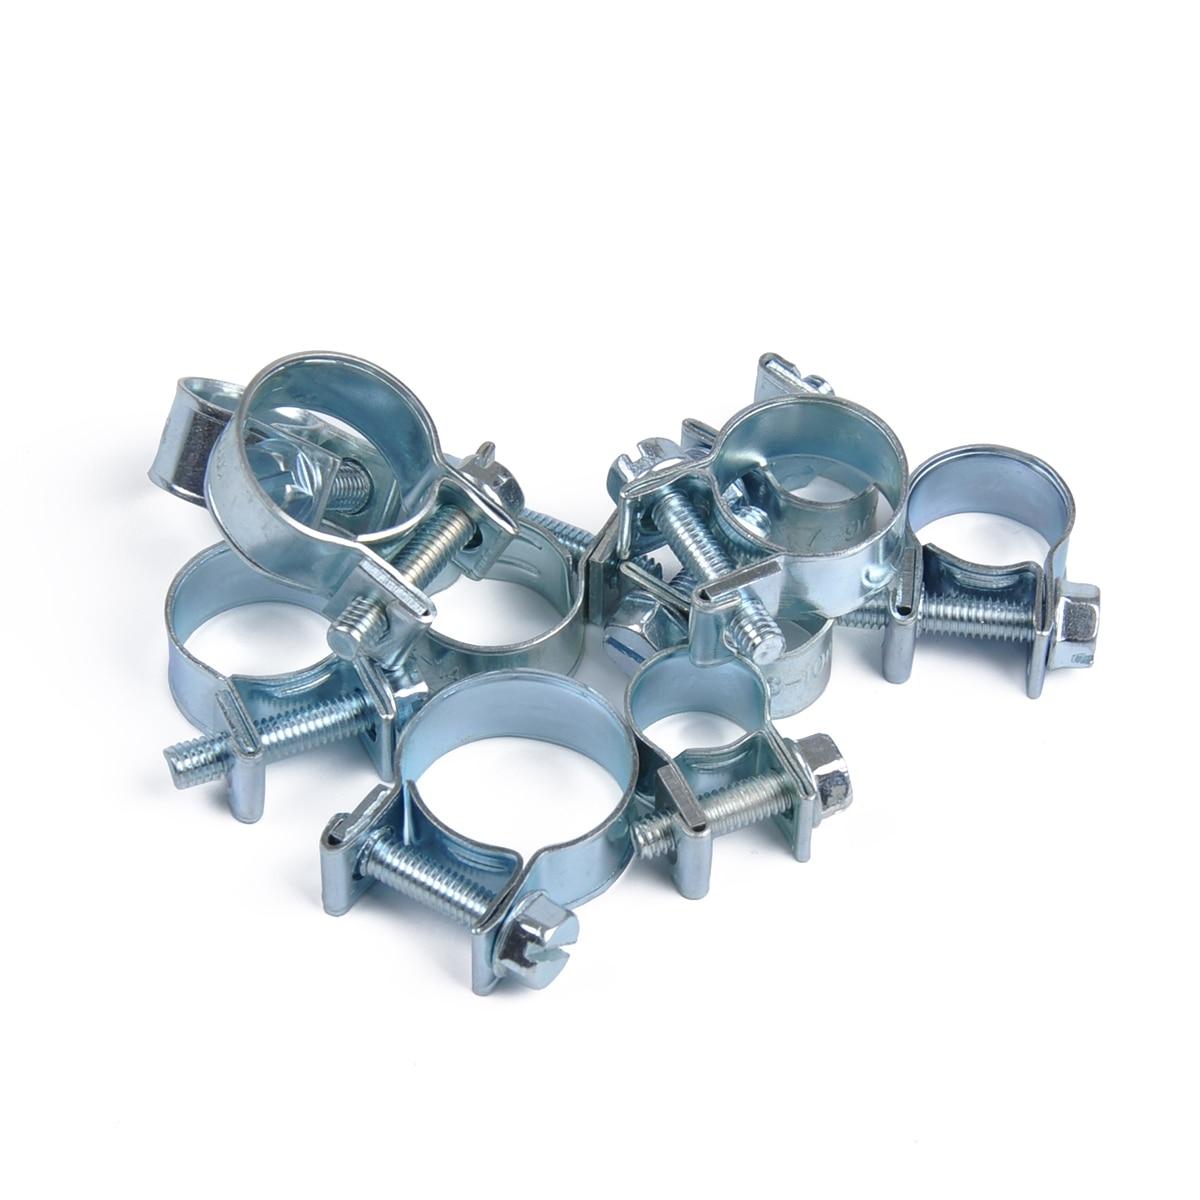 11-13mm Zinc Plated Mini Fuel Hose Line Pipe Clips x10